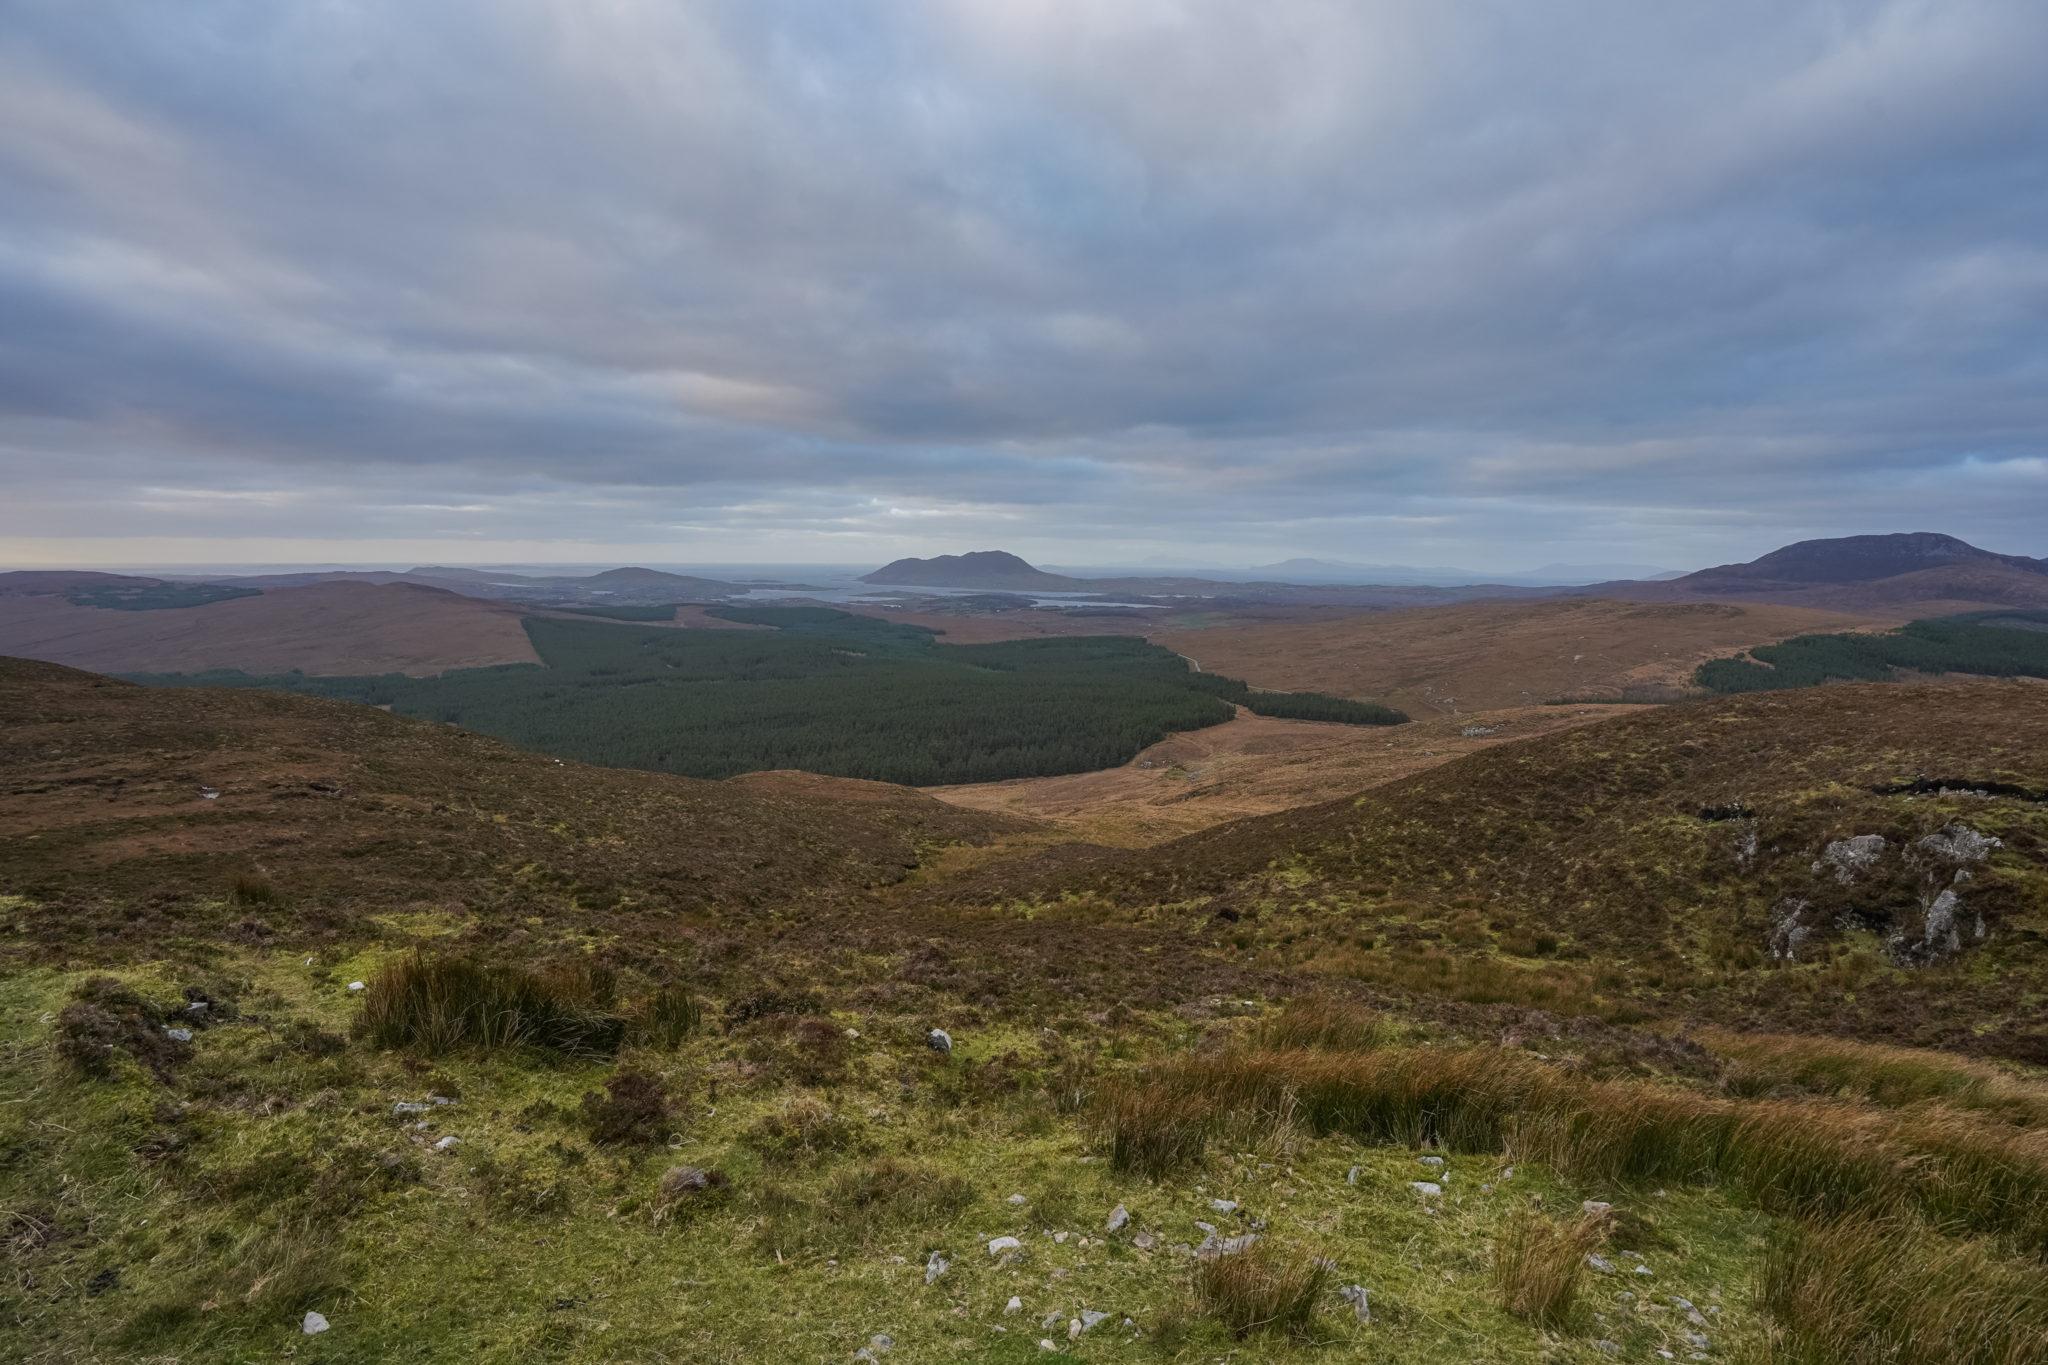 connemara-irlande-road-trip-vue